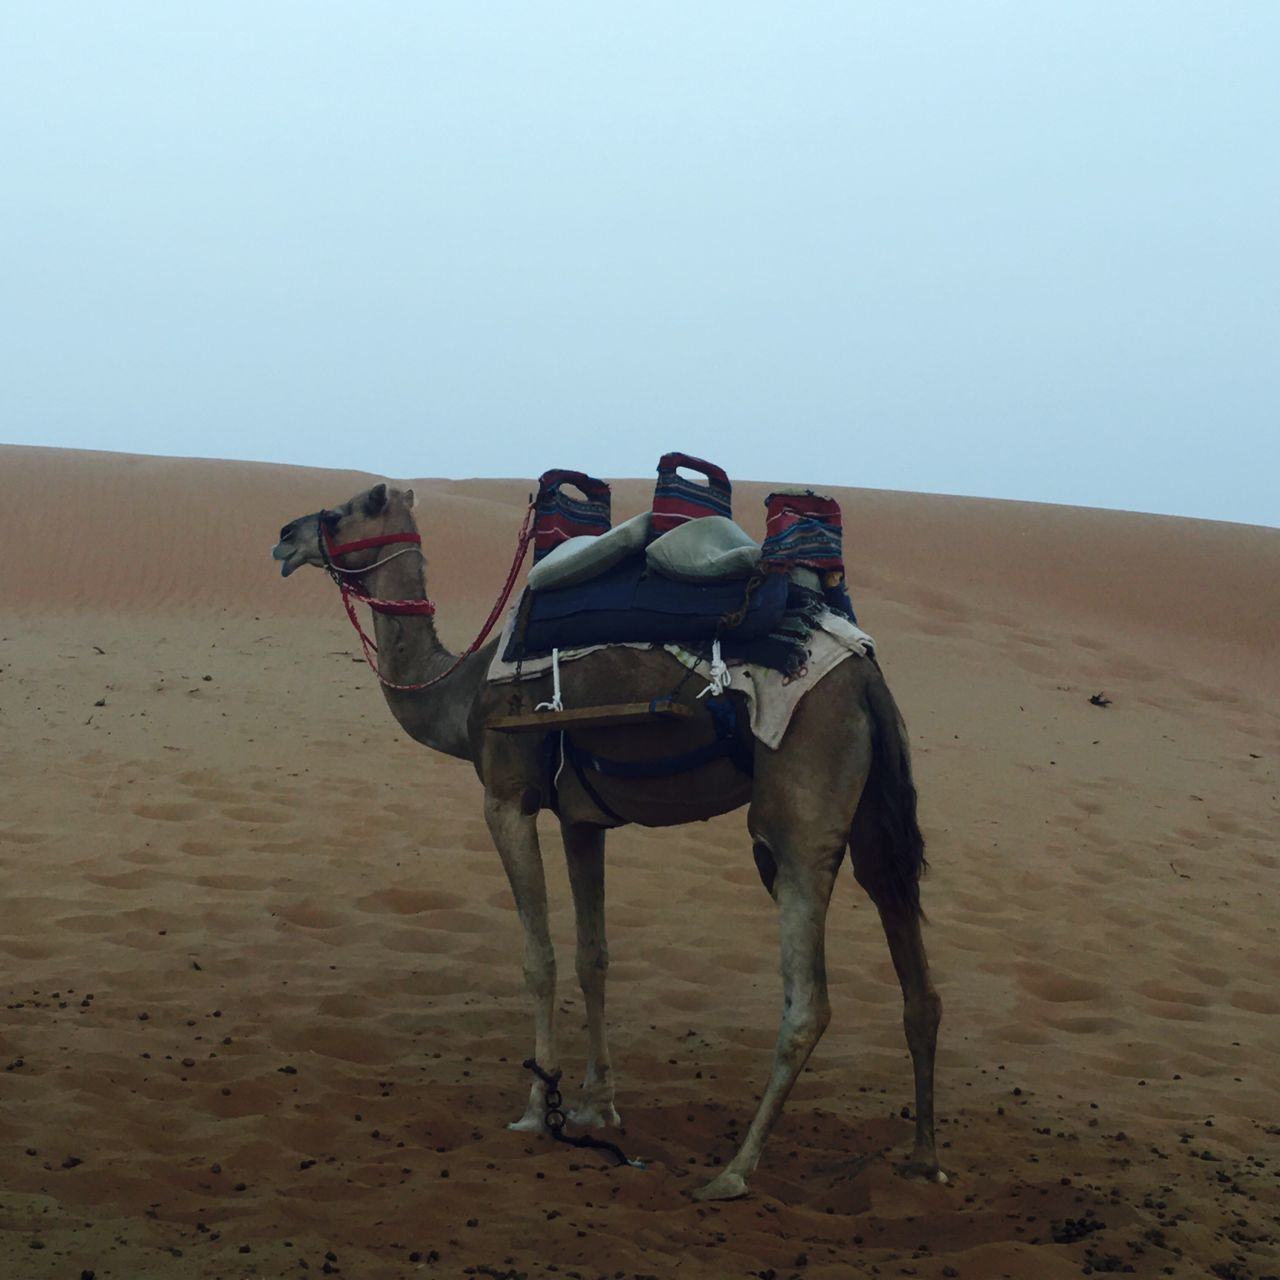 Camel Camel Riding Domestic Animals One Animal Working Animal Livestock Mammal Bridle Herbivorous Vertebrate Horseback Riding Transportation Desert Clear Sky Riding Camel Landscape Saddle Sand Full Length Zoology